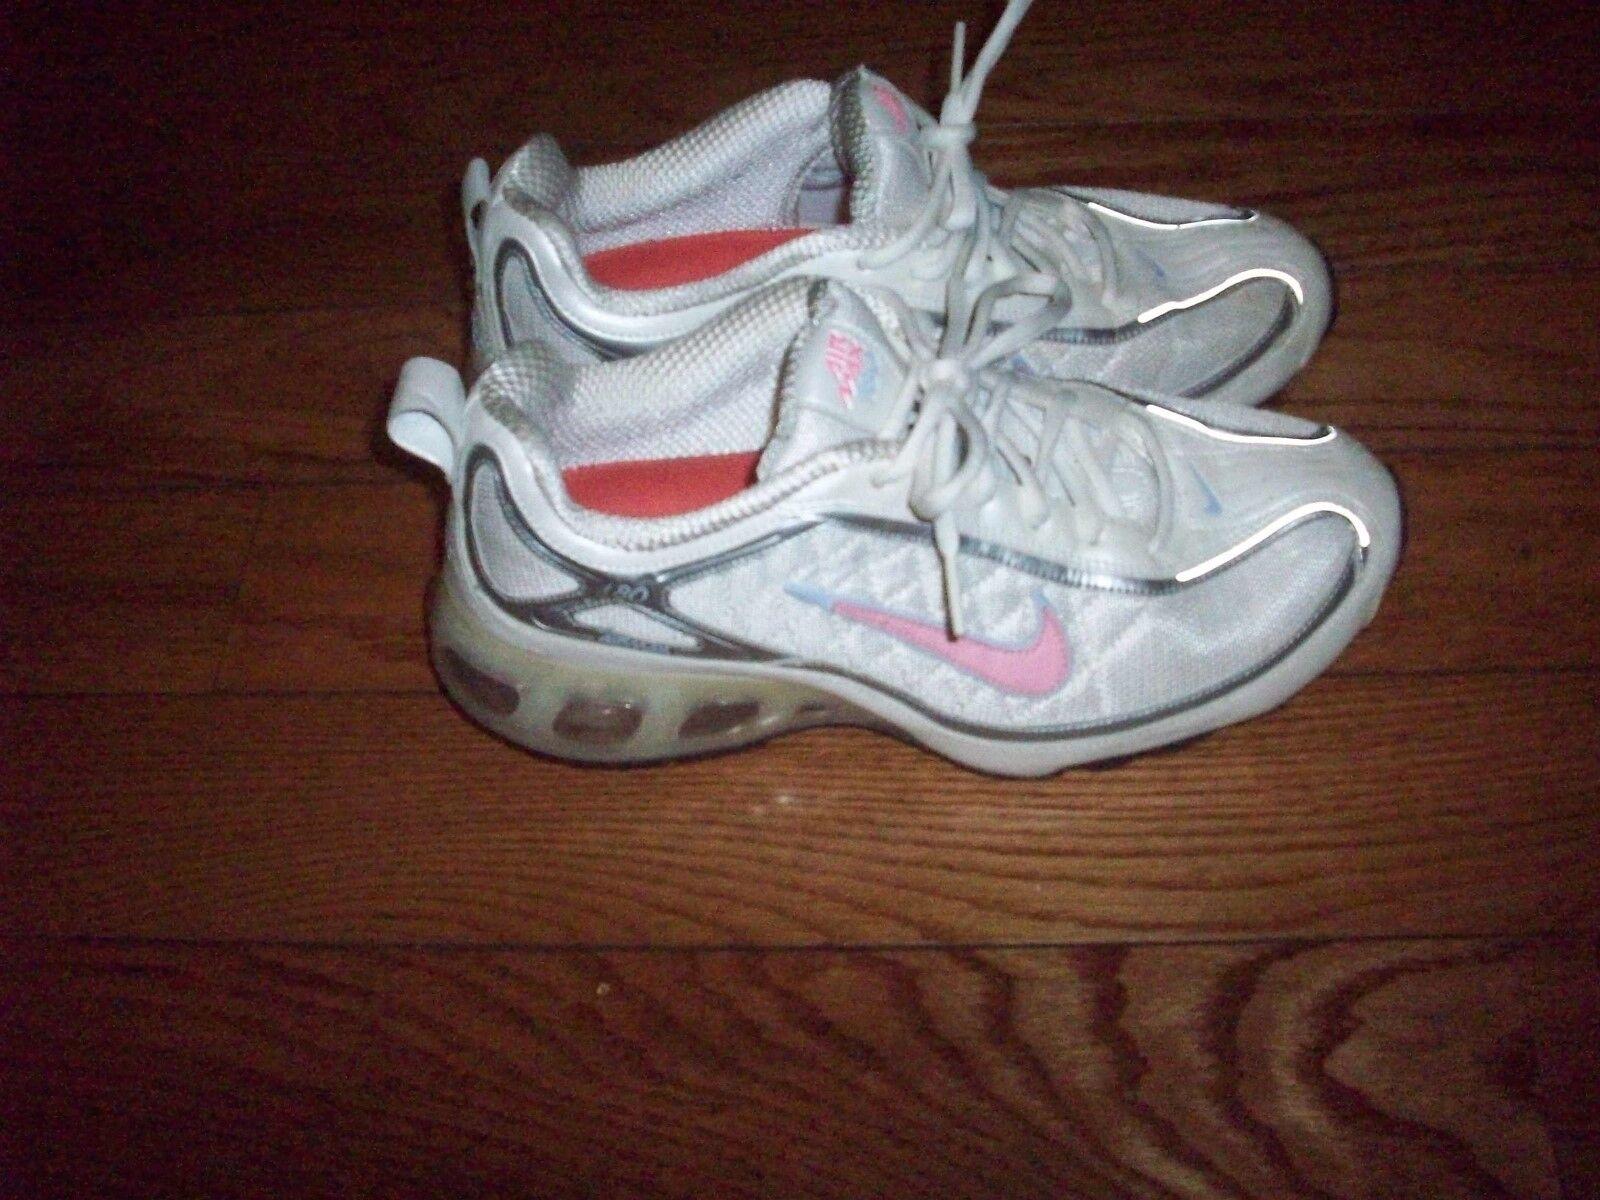 ea6a0f539 Nike Nike Nike Air Max 180 women s running shoes sneakers training pink  white size 8.5 3ea2ea